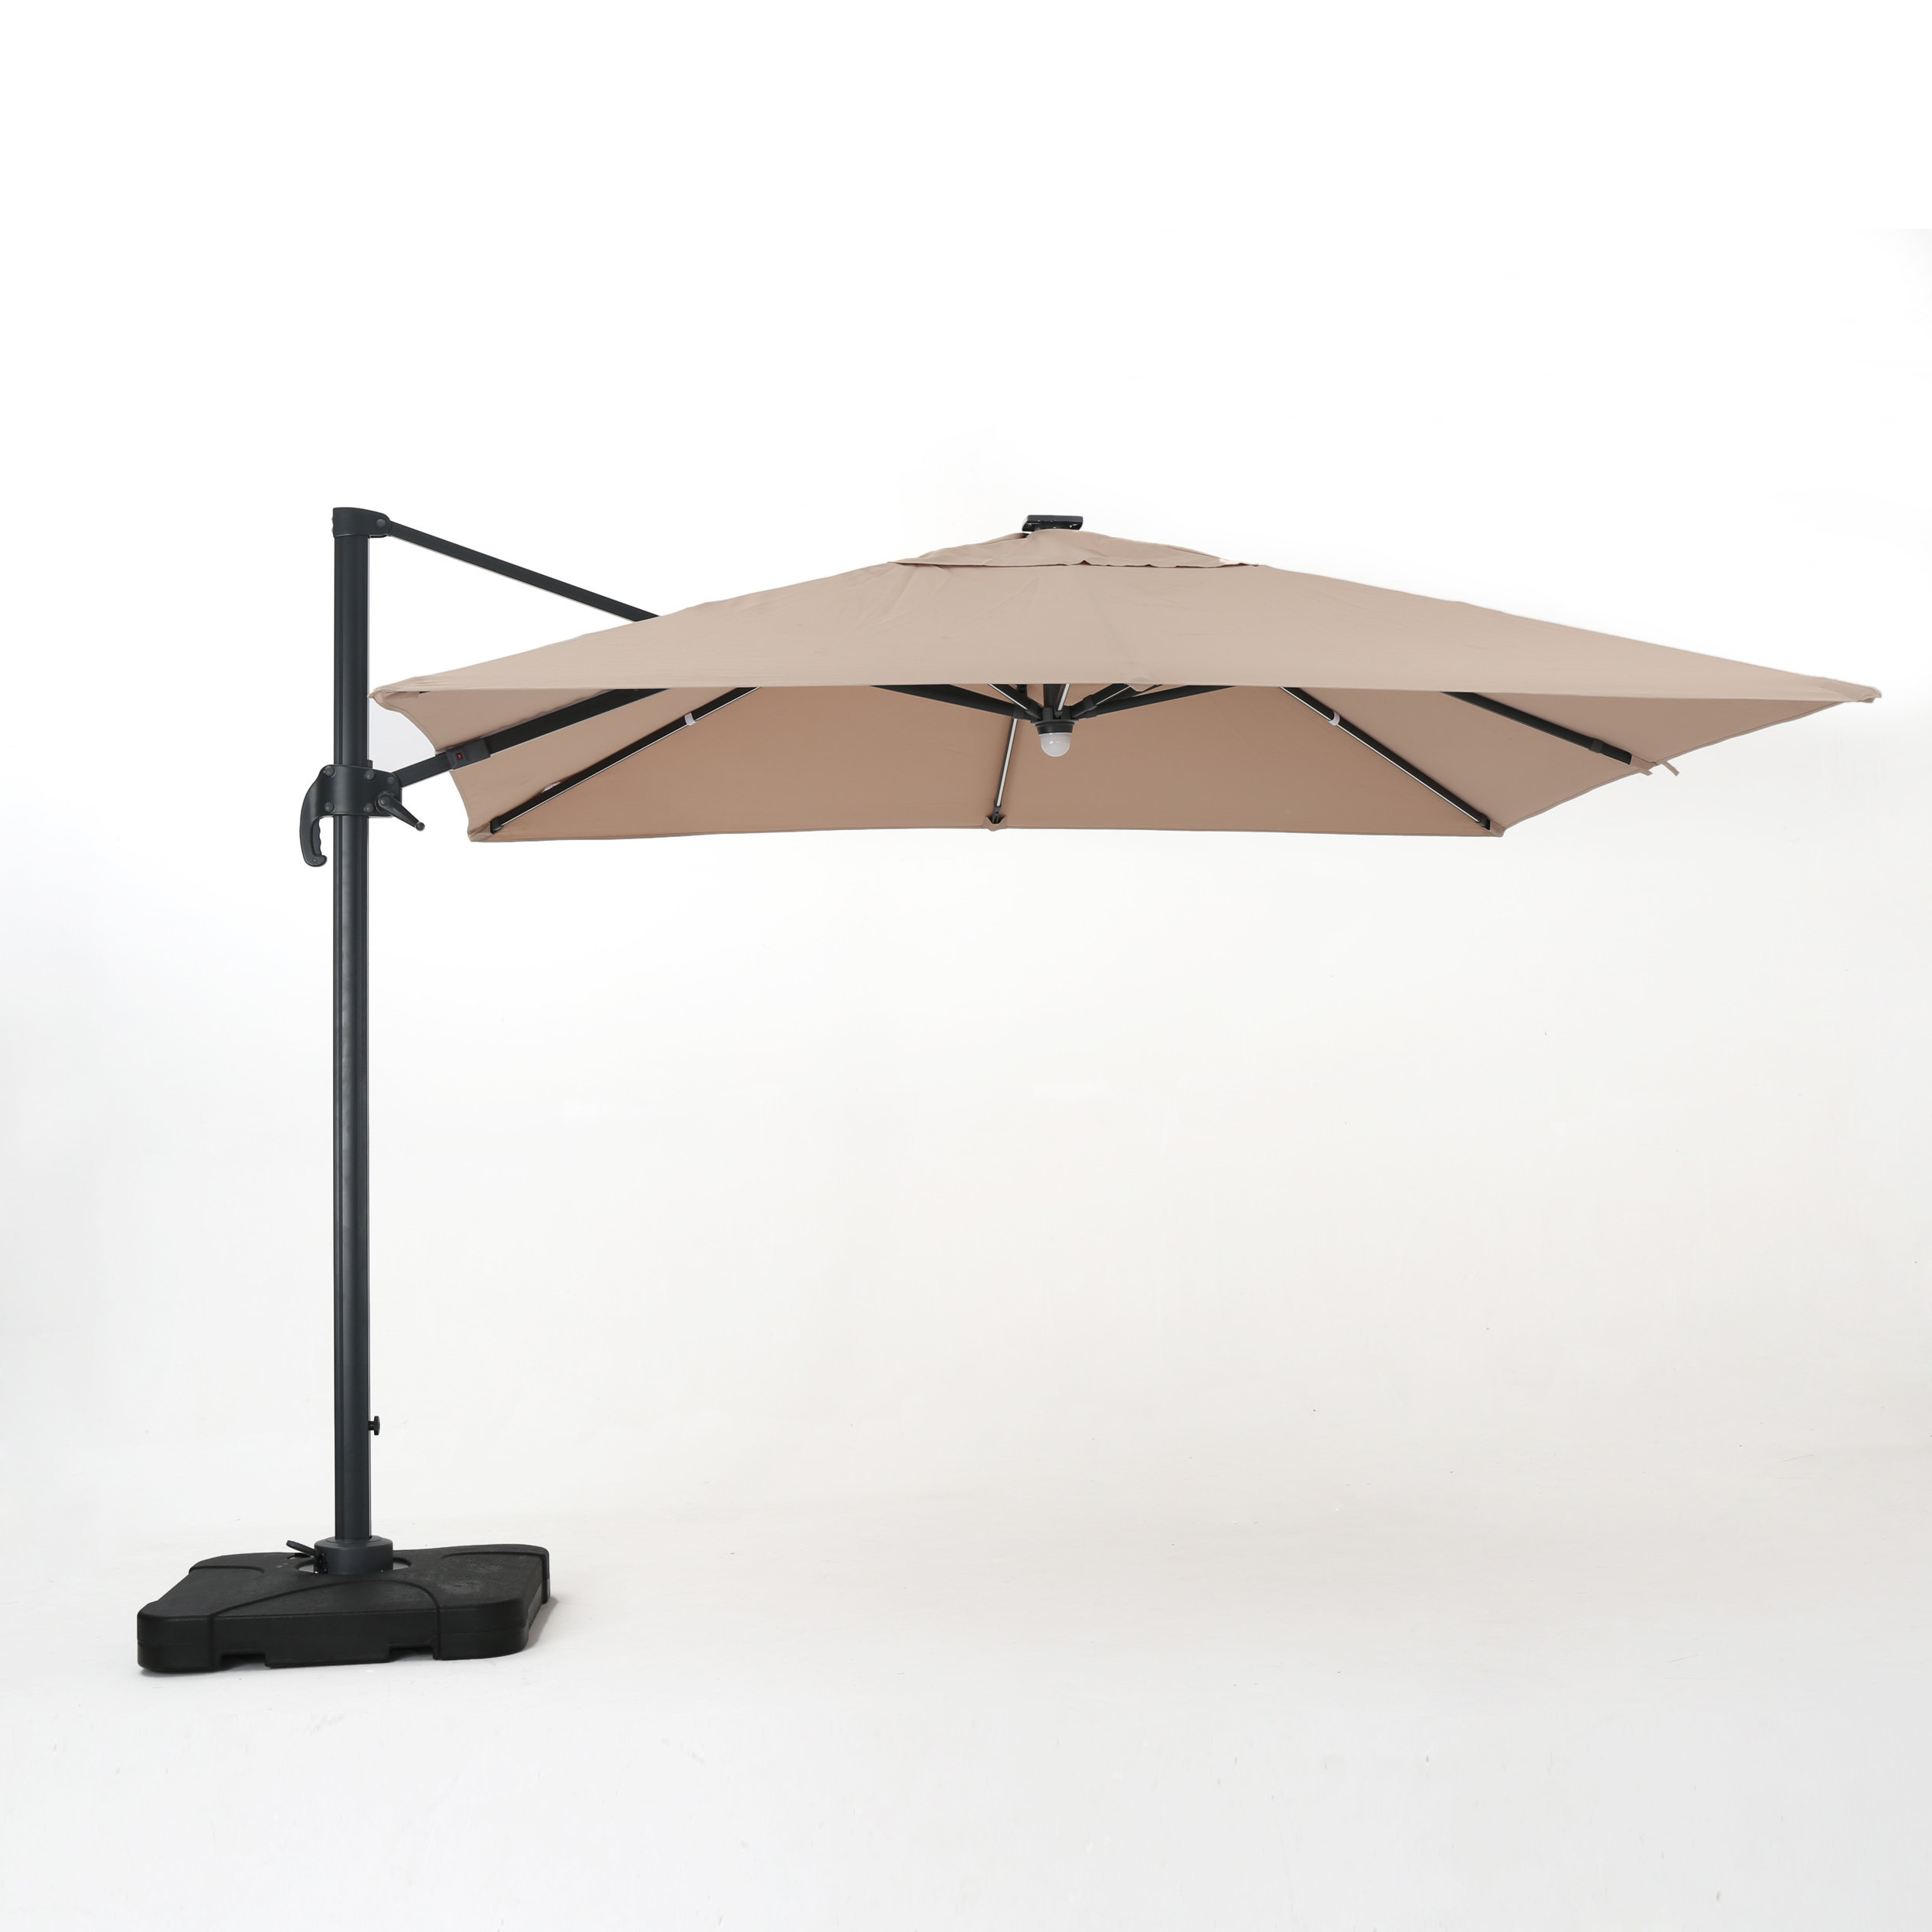 Featured Photo of Krystal Square Cantilever Sunbrella Umbrellas